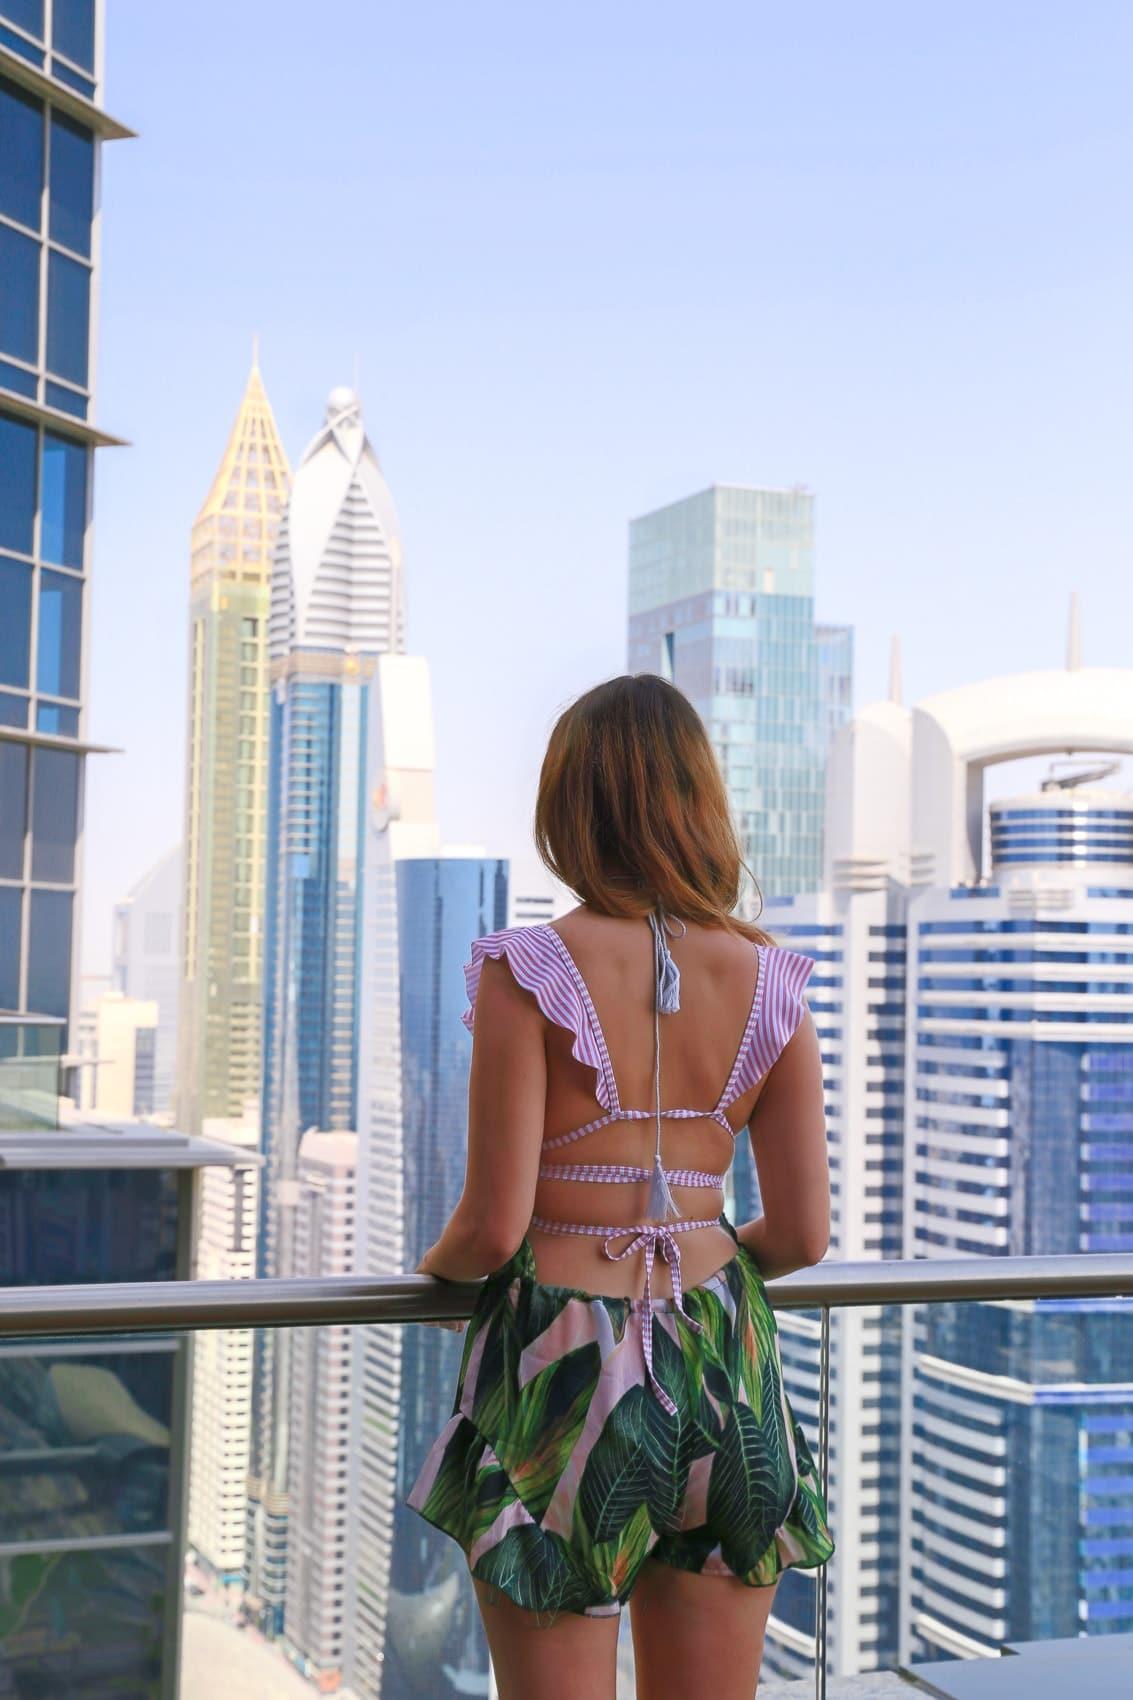 luxushotel-shangri-la-dubai-zimmer-pool-mit-blick-auf-den-burj-khalifa-reiseblog-des-belles-choses 45